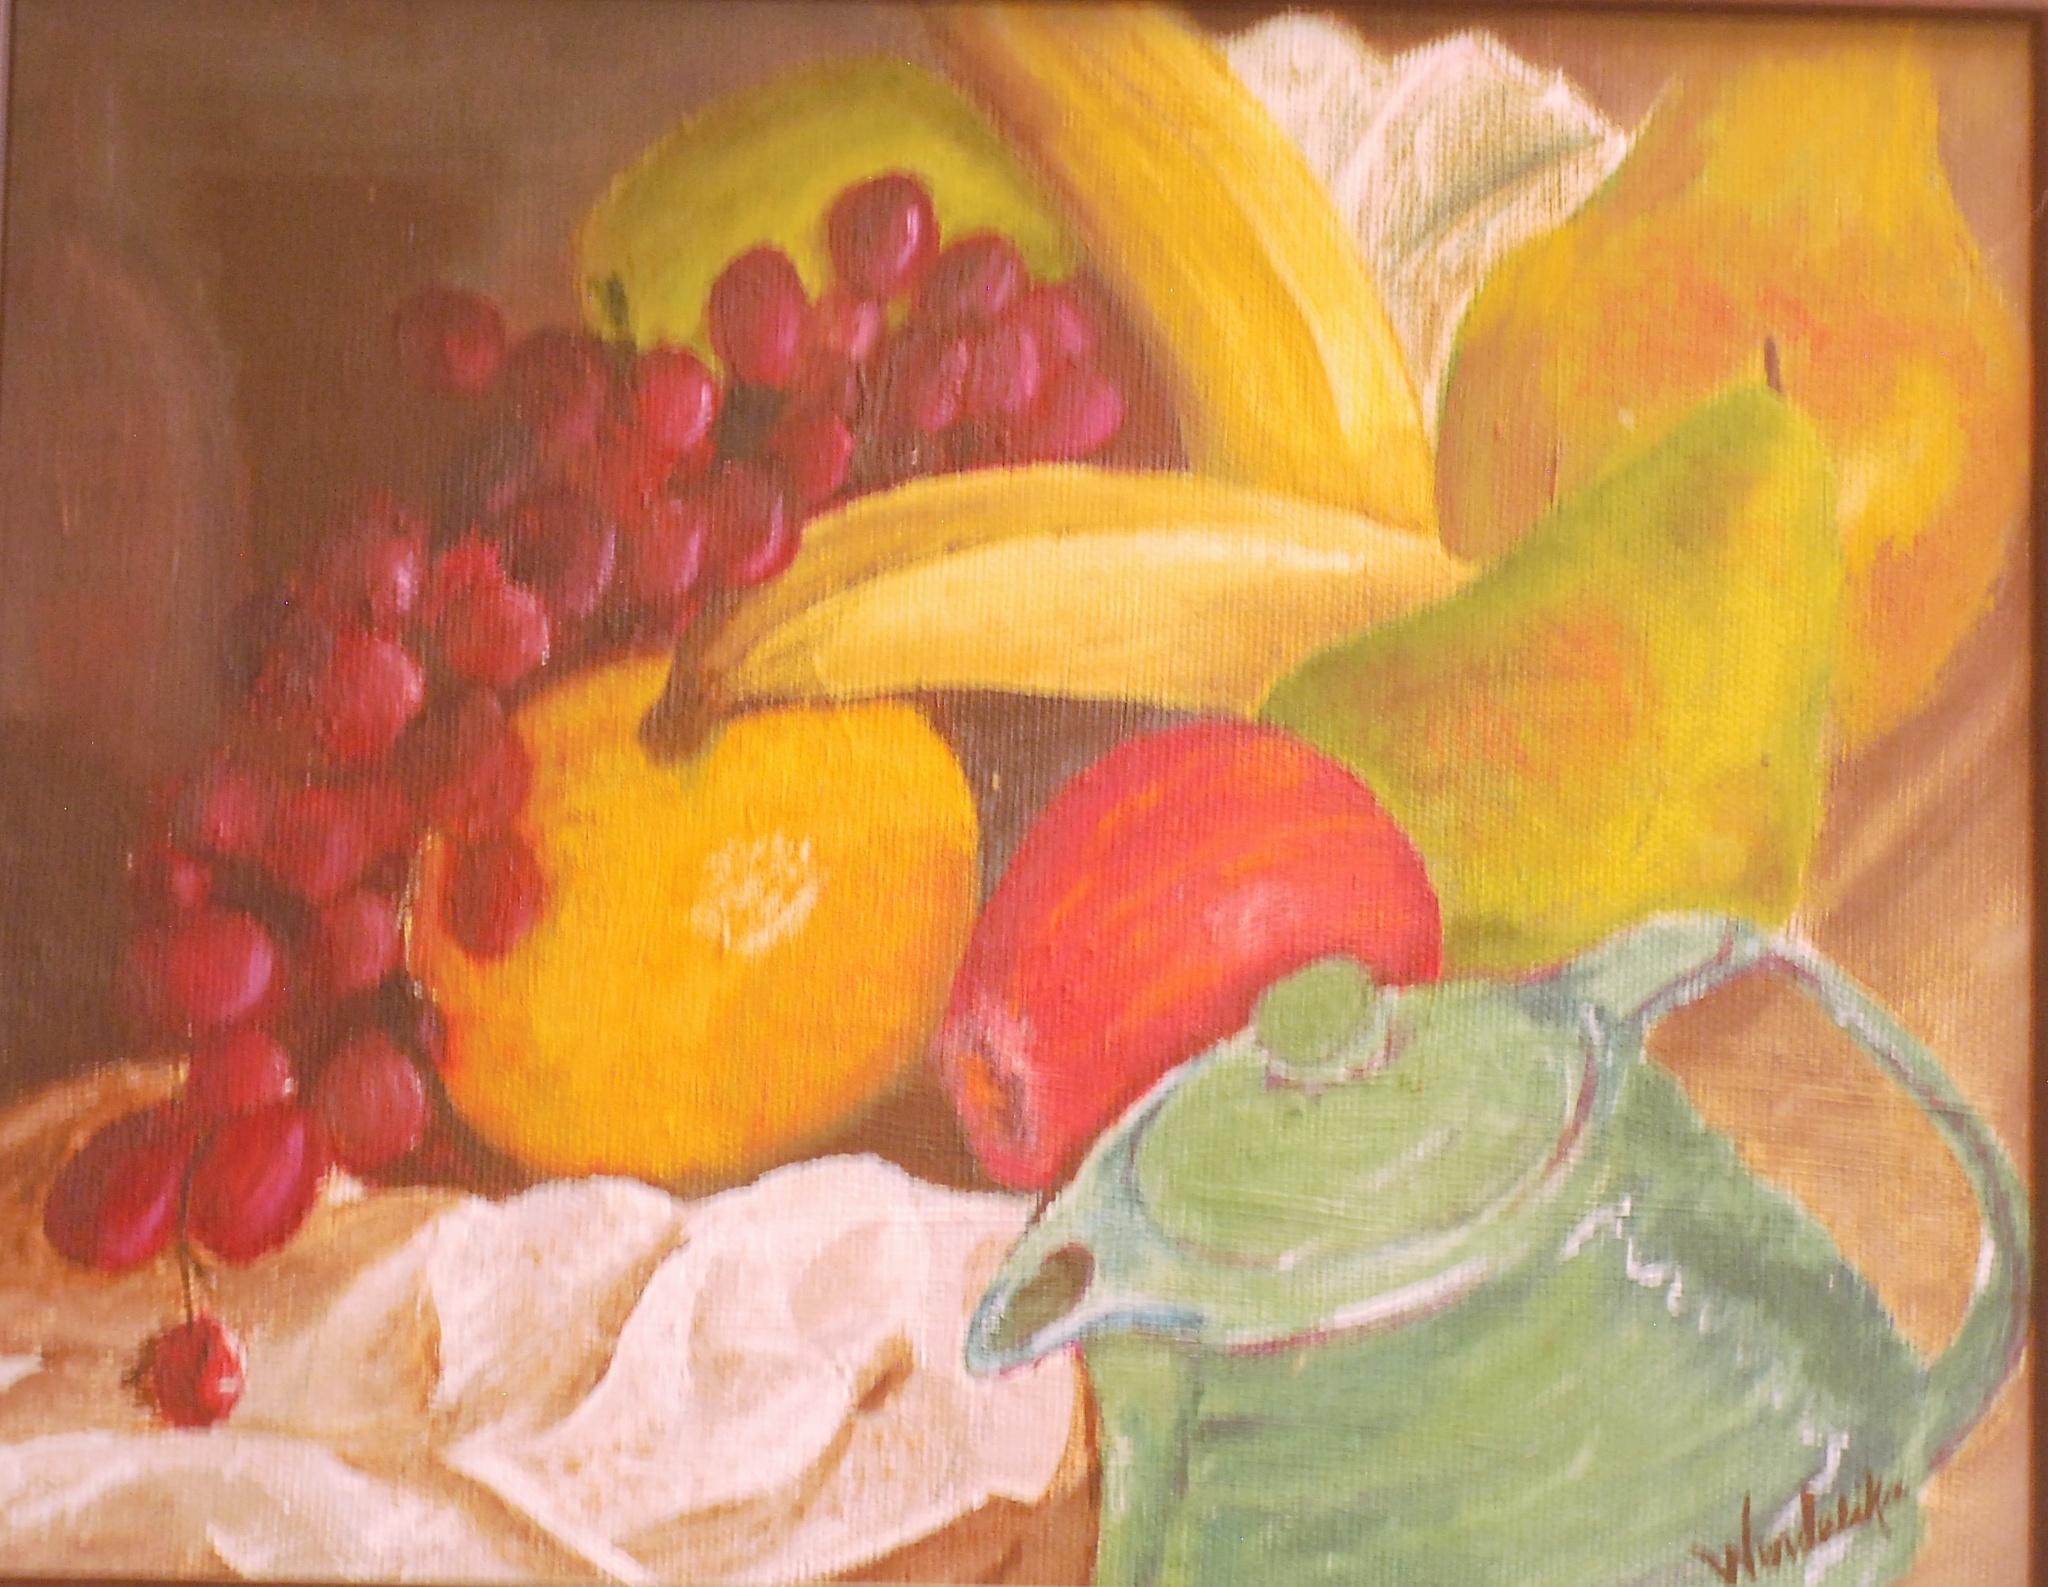 Fruit by marilyn wirtz